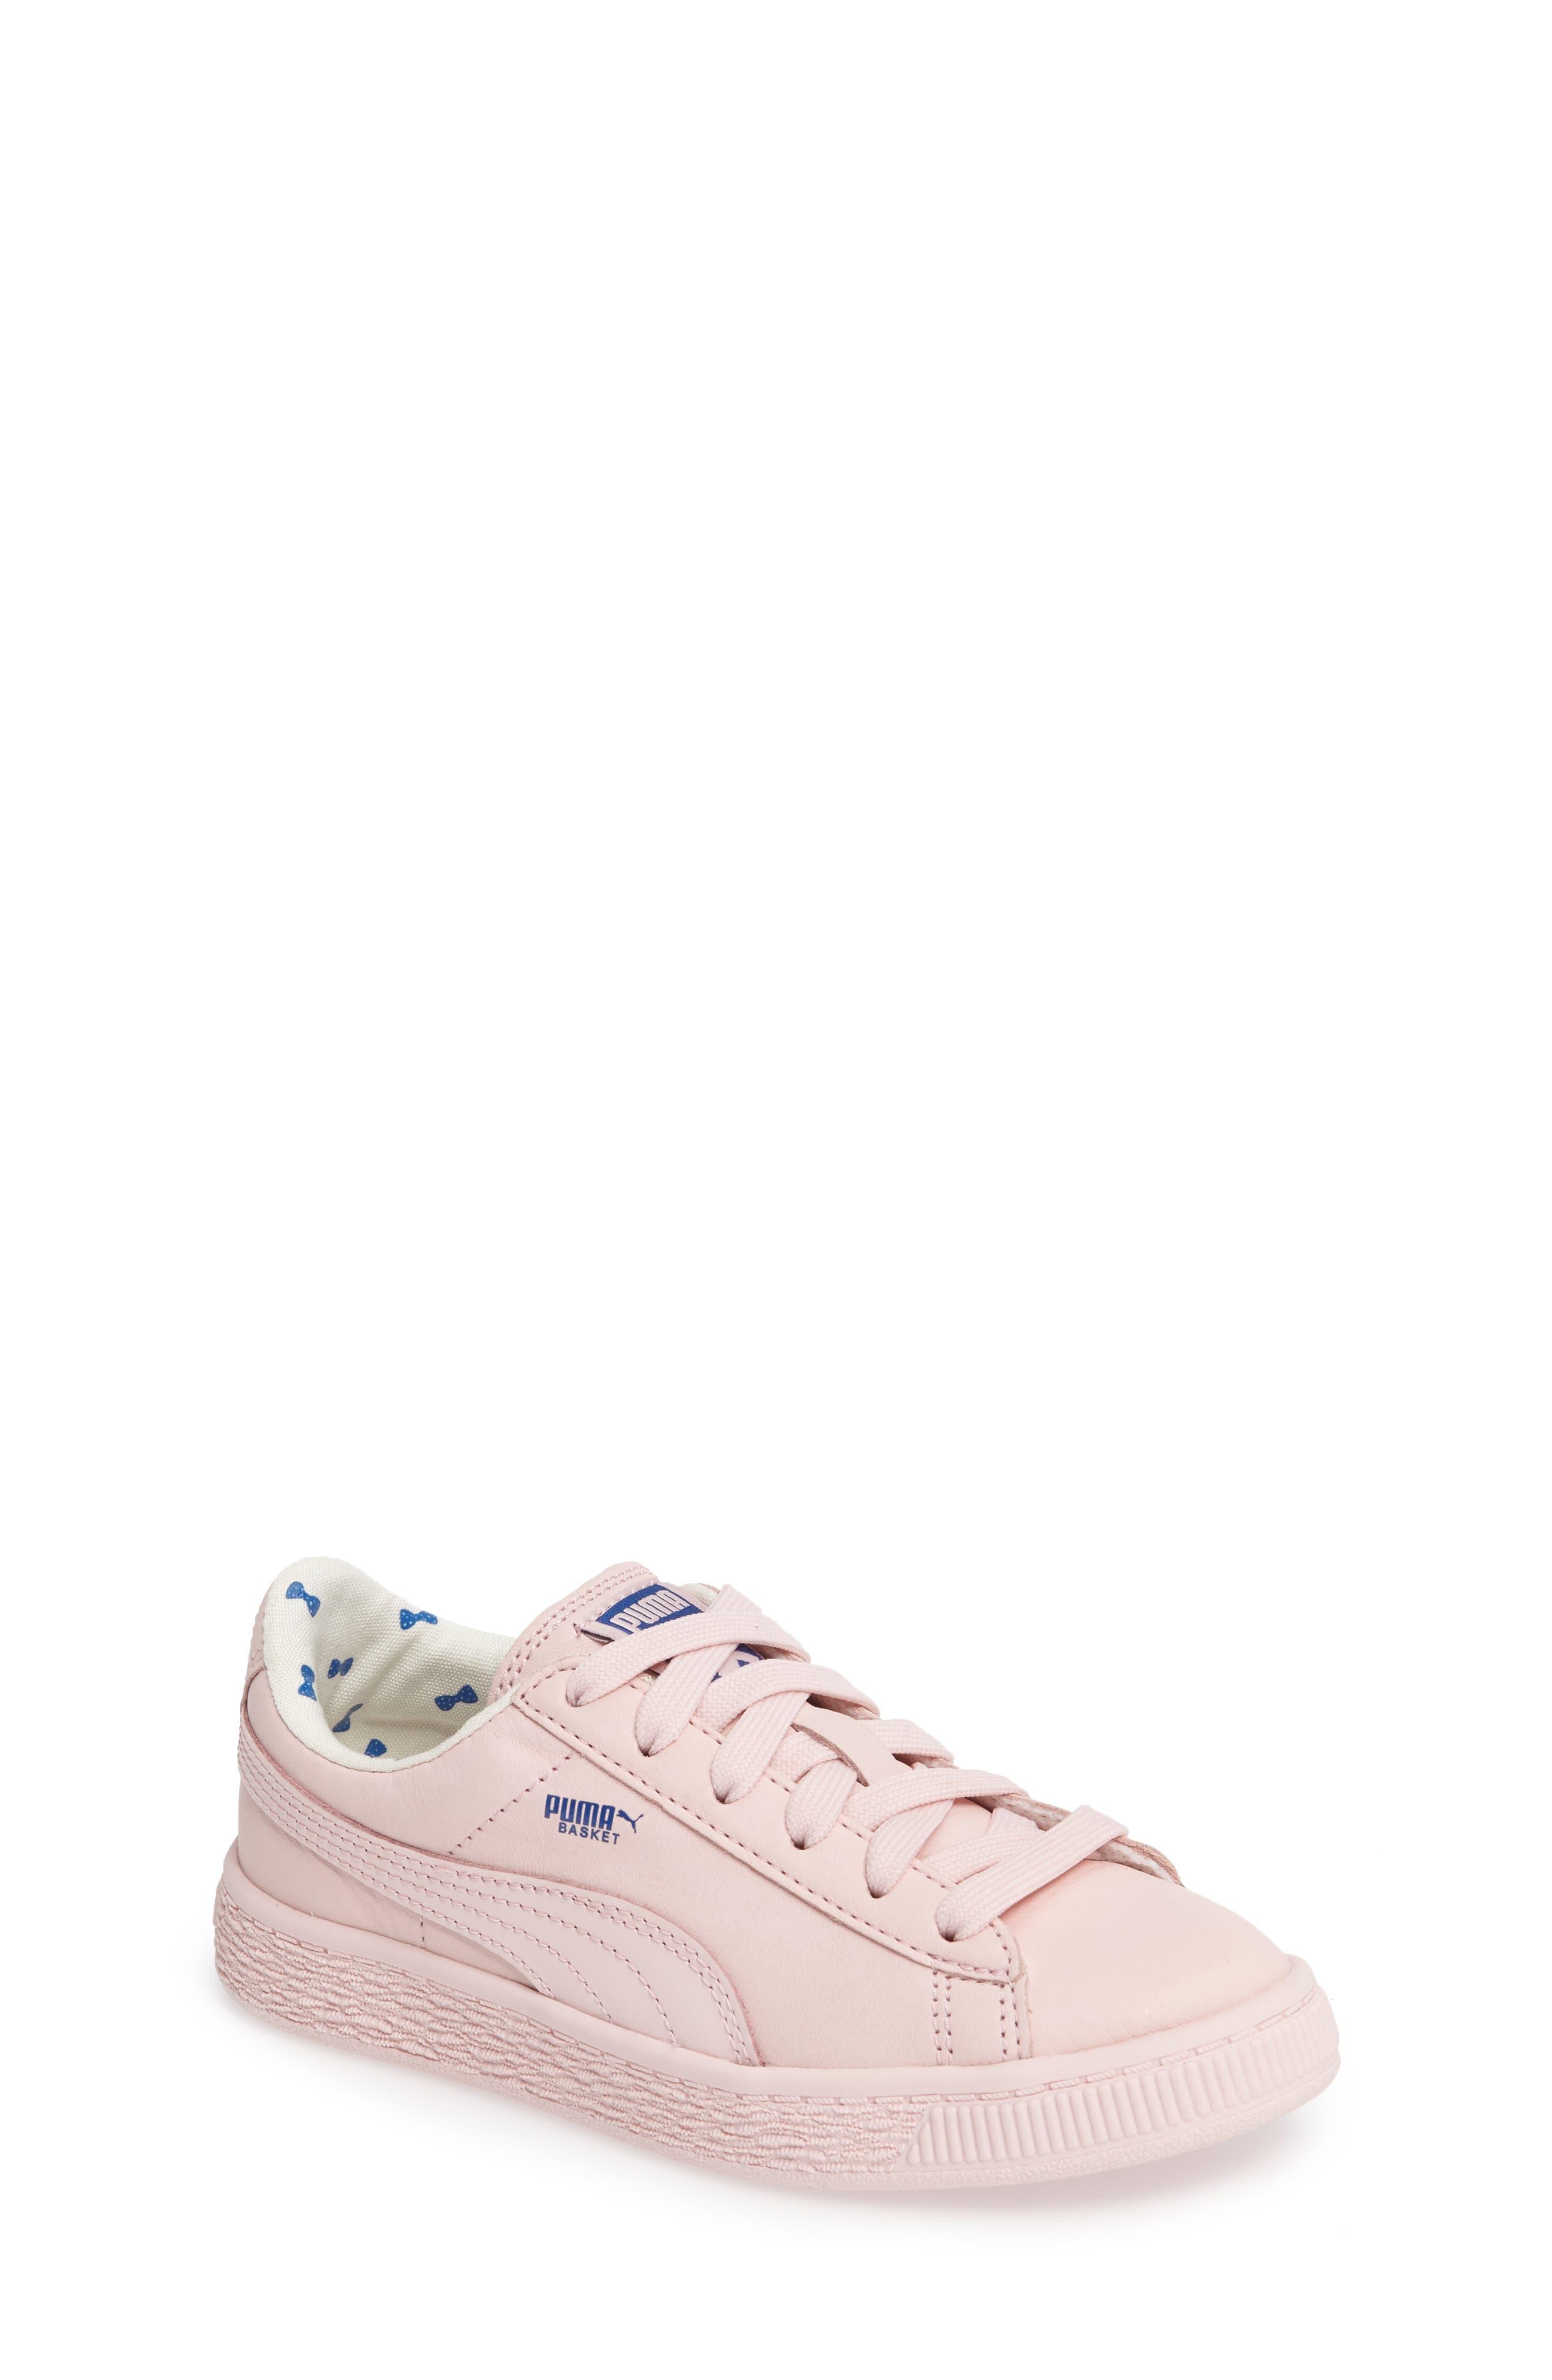 PUMA x tinycottons Basket Sneaker (Toddler & Little Kid)